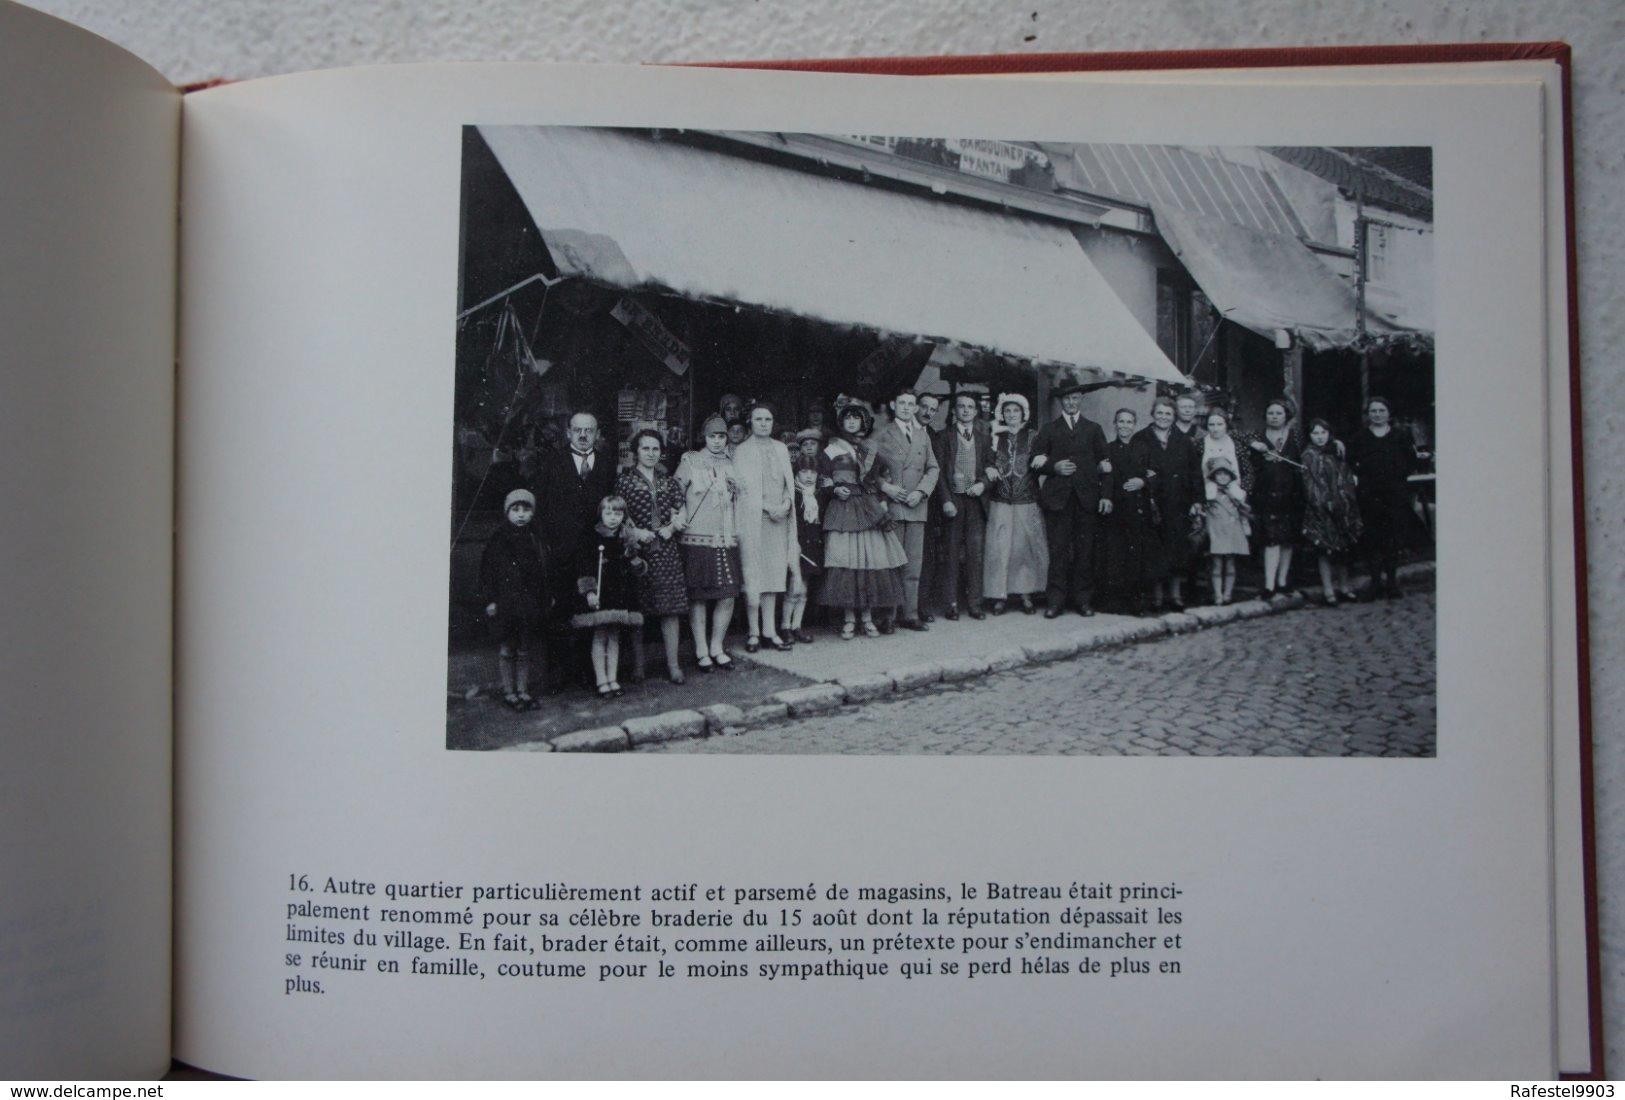 Livre CARNIERES Région Morlanwelz Bascoup Recueil De Cartes Postales Anciennes Hainaut - Boeken, Tijdschriften, Stripverhalen